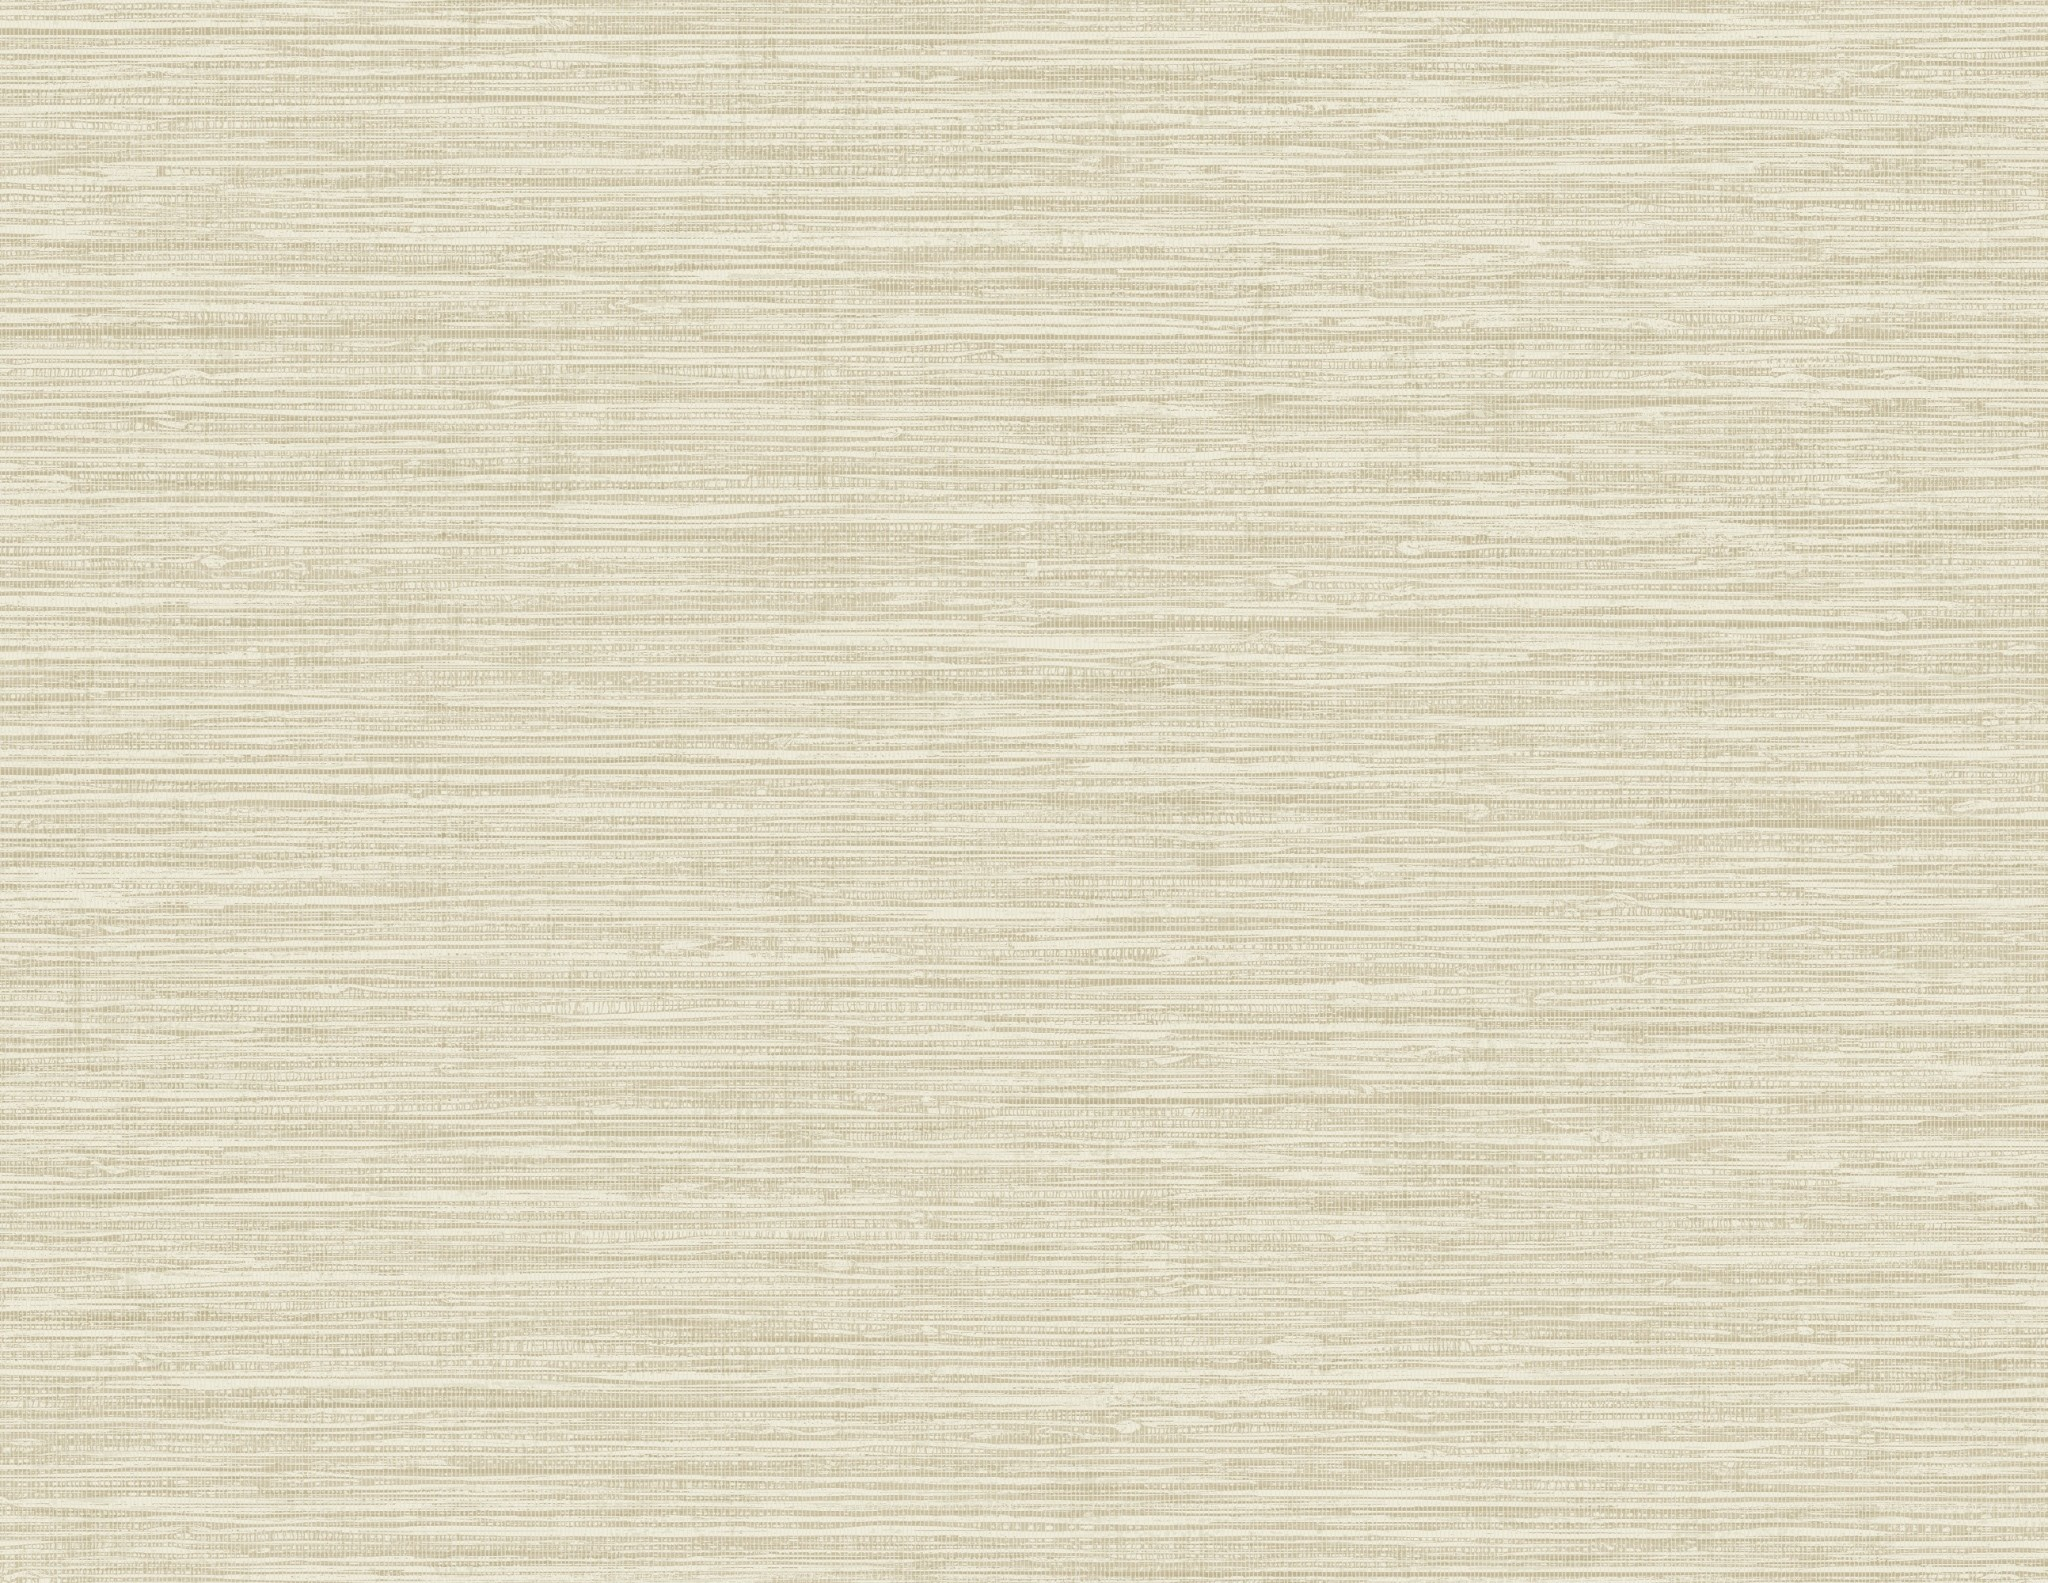 Wallquest Nautical Twine Stringcloth